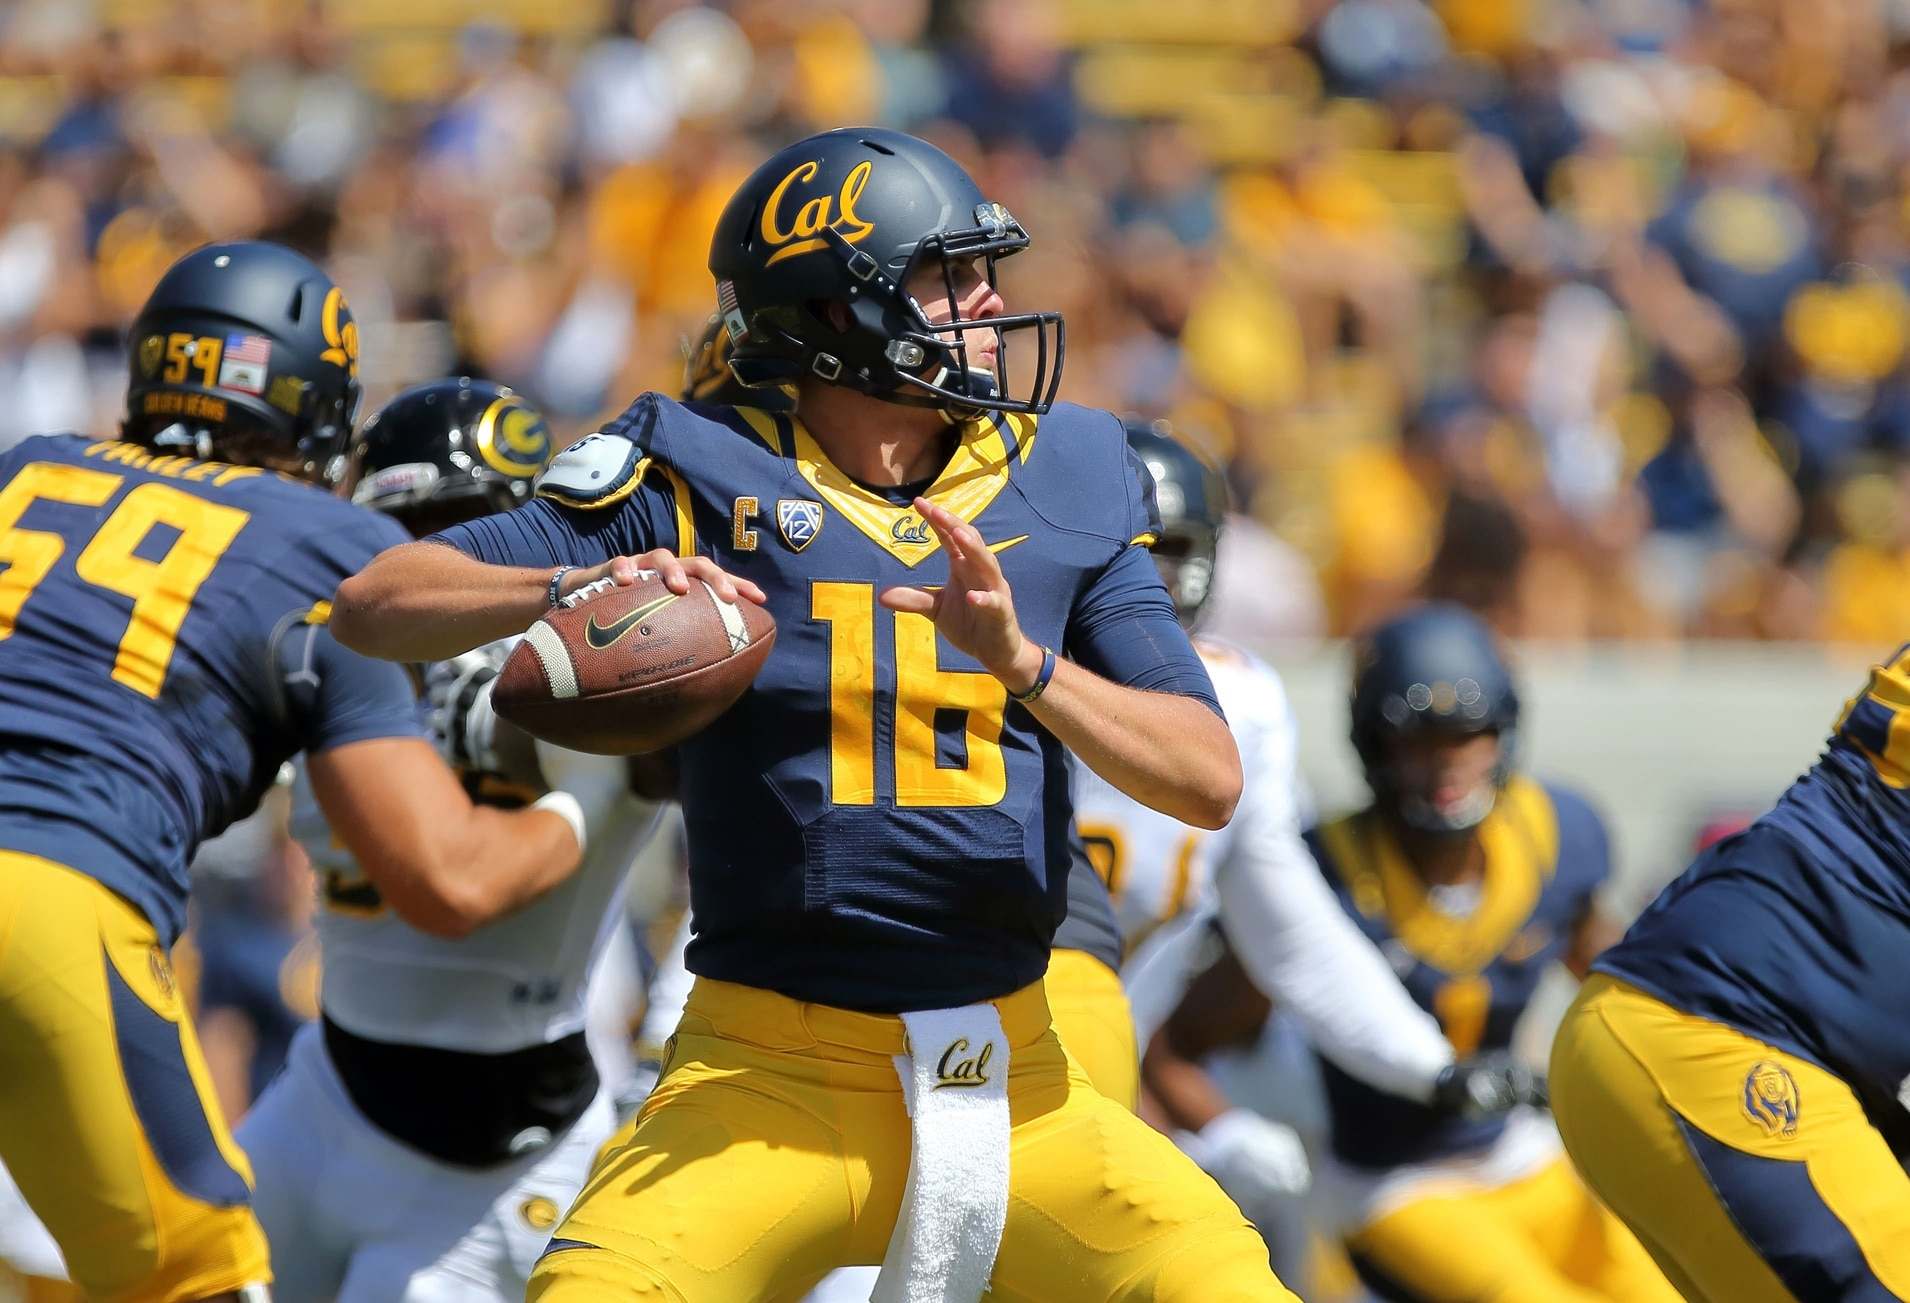 Jared Goff Cal, 49ers NFL Draft, 2016 NFL Draft